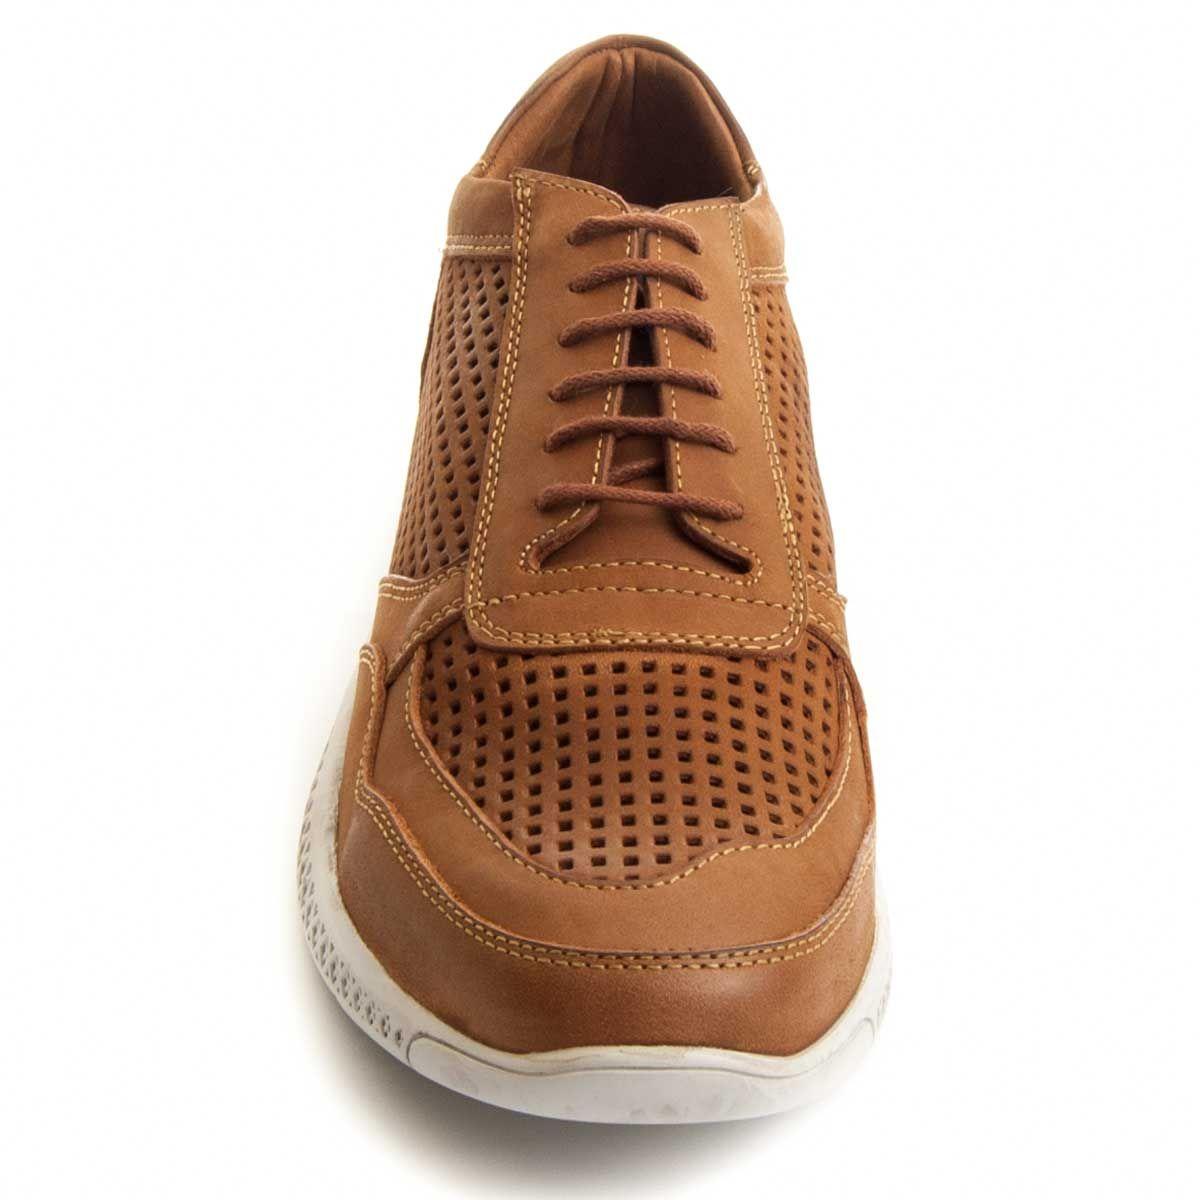 Montevita Laser Cut Sneaker in Brown